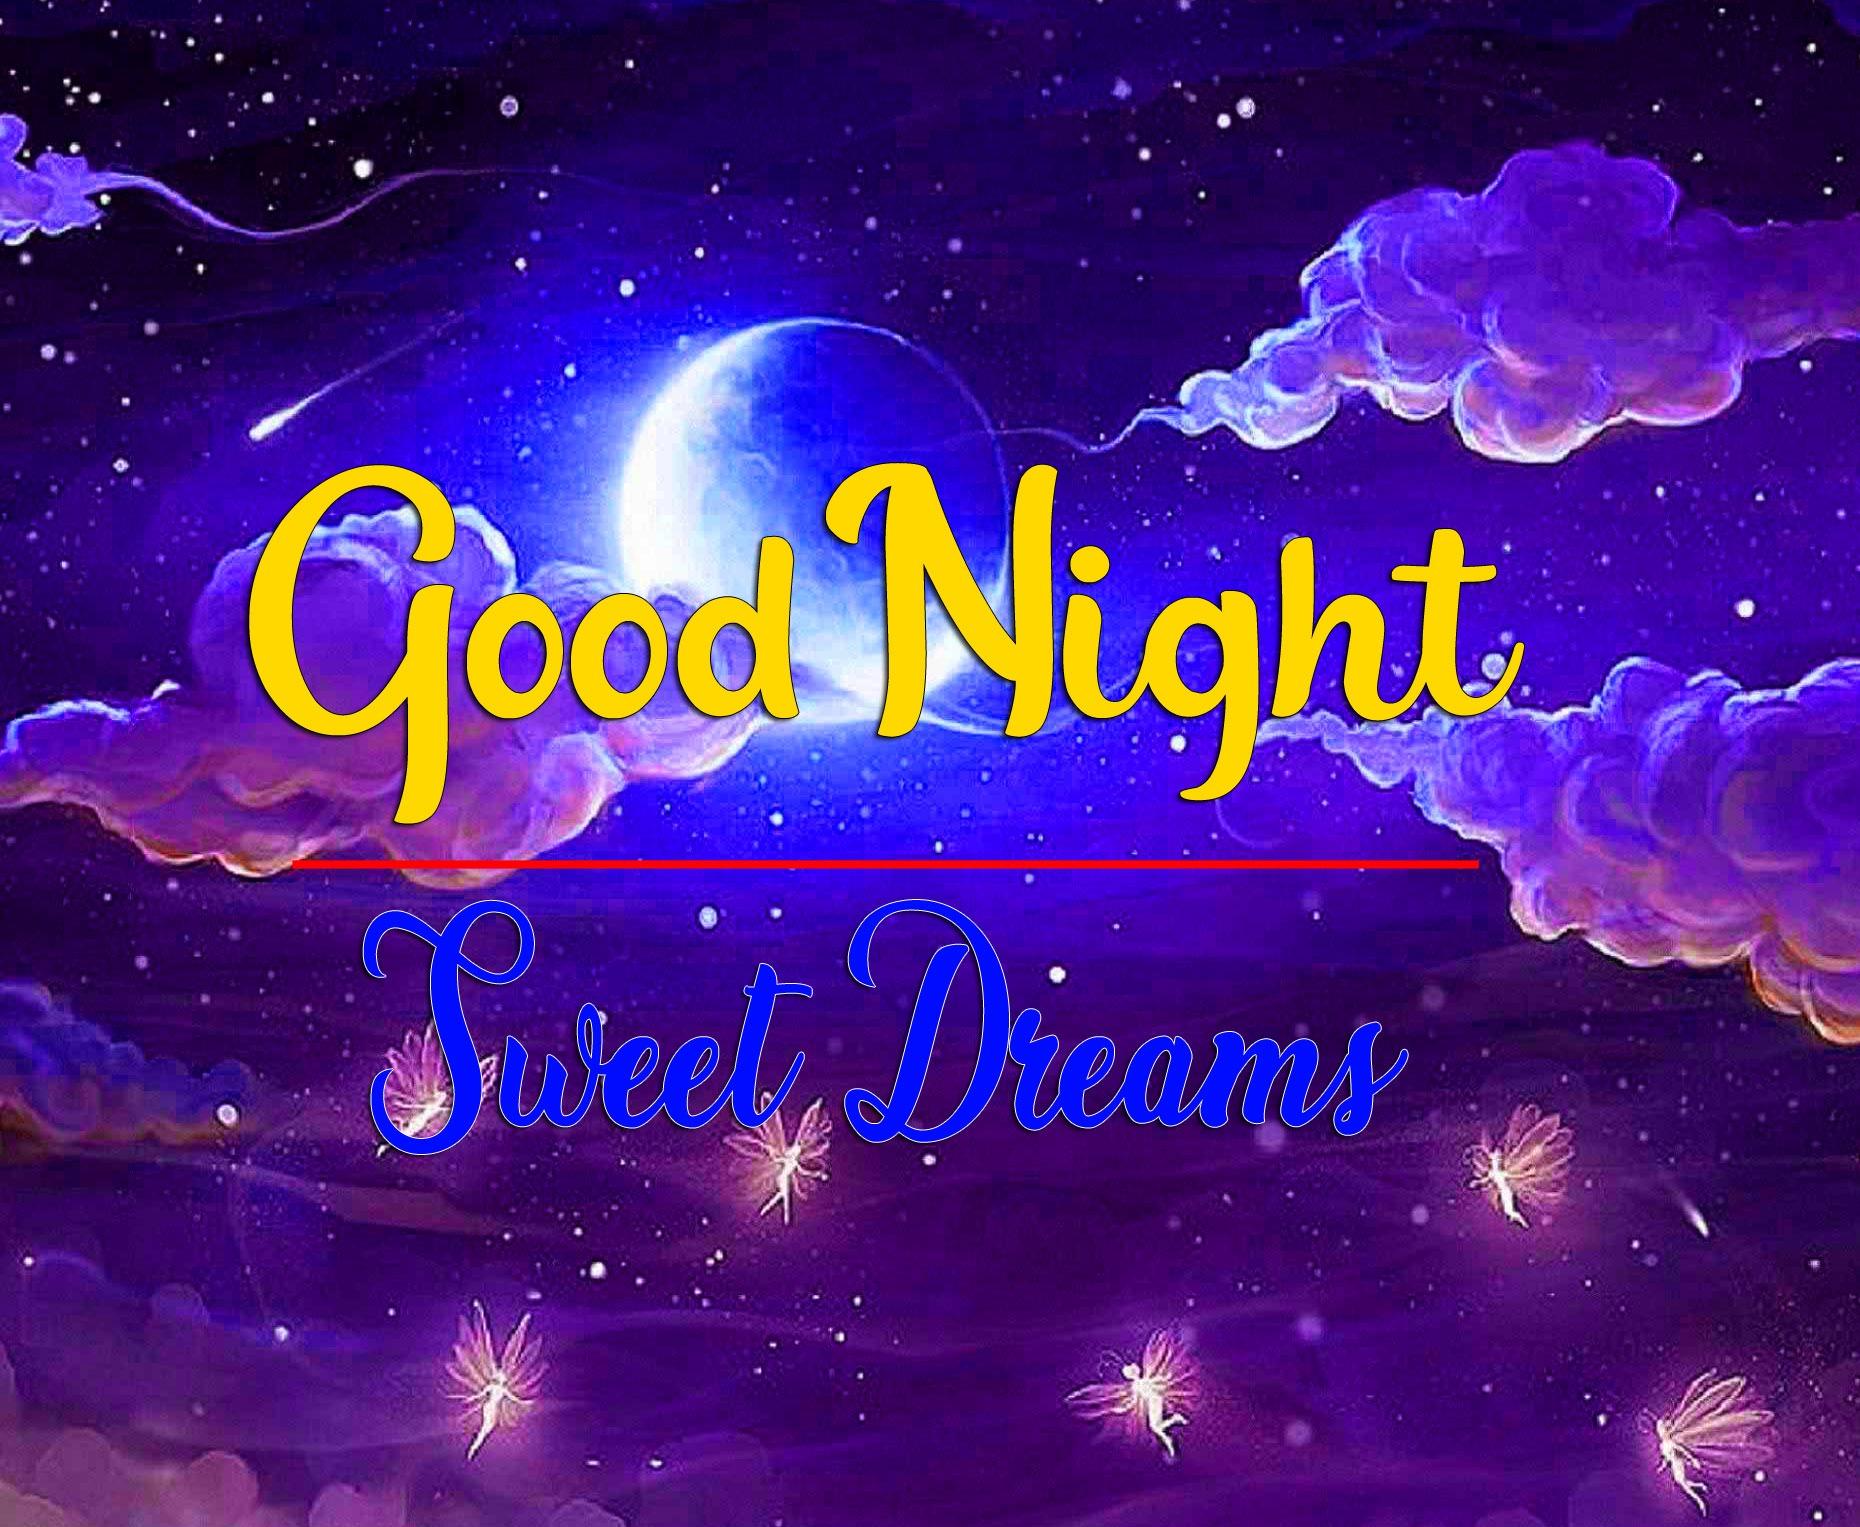 HD Good Night Photo Download